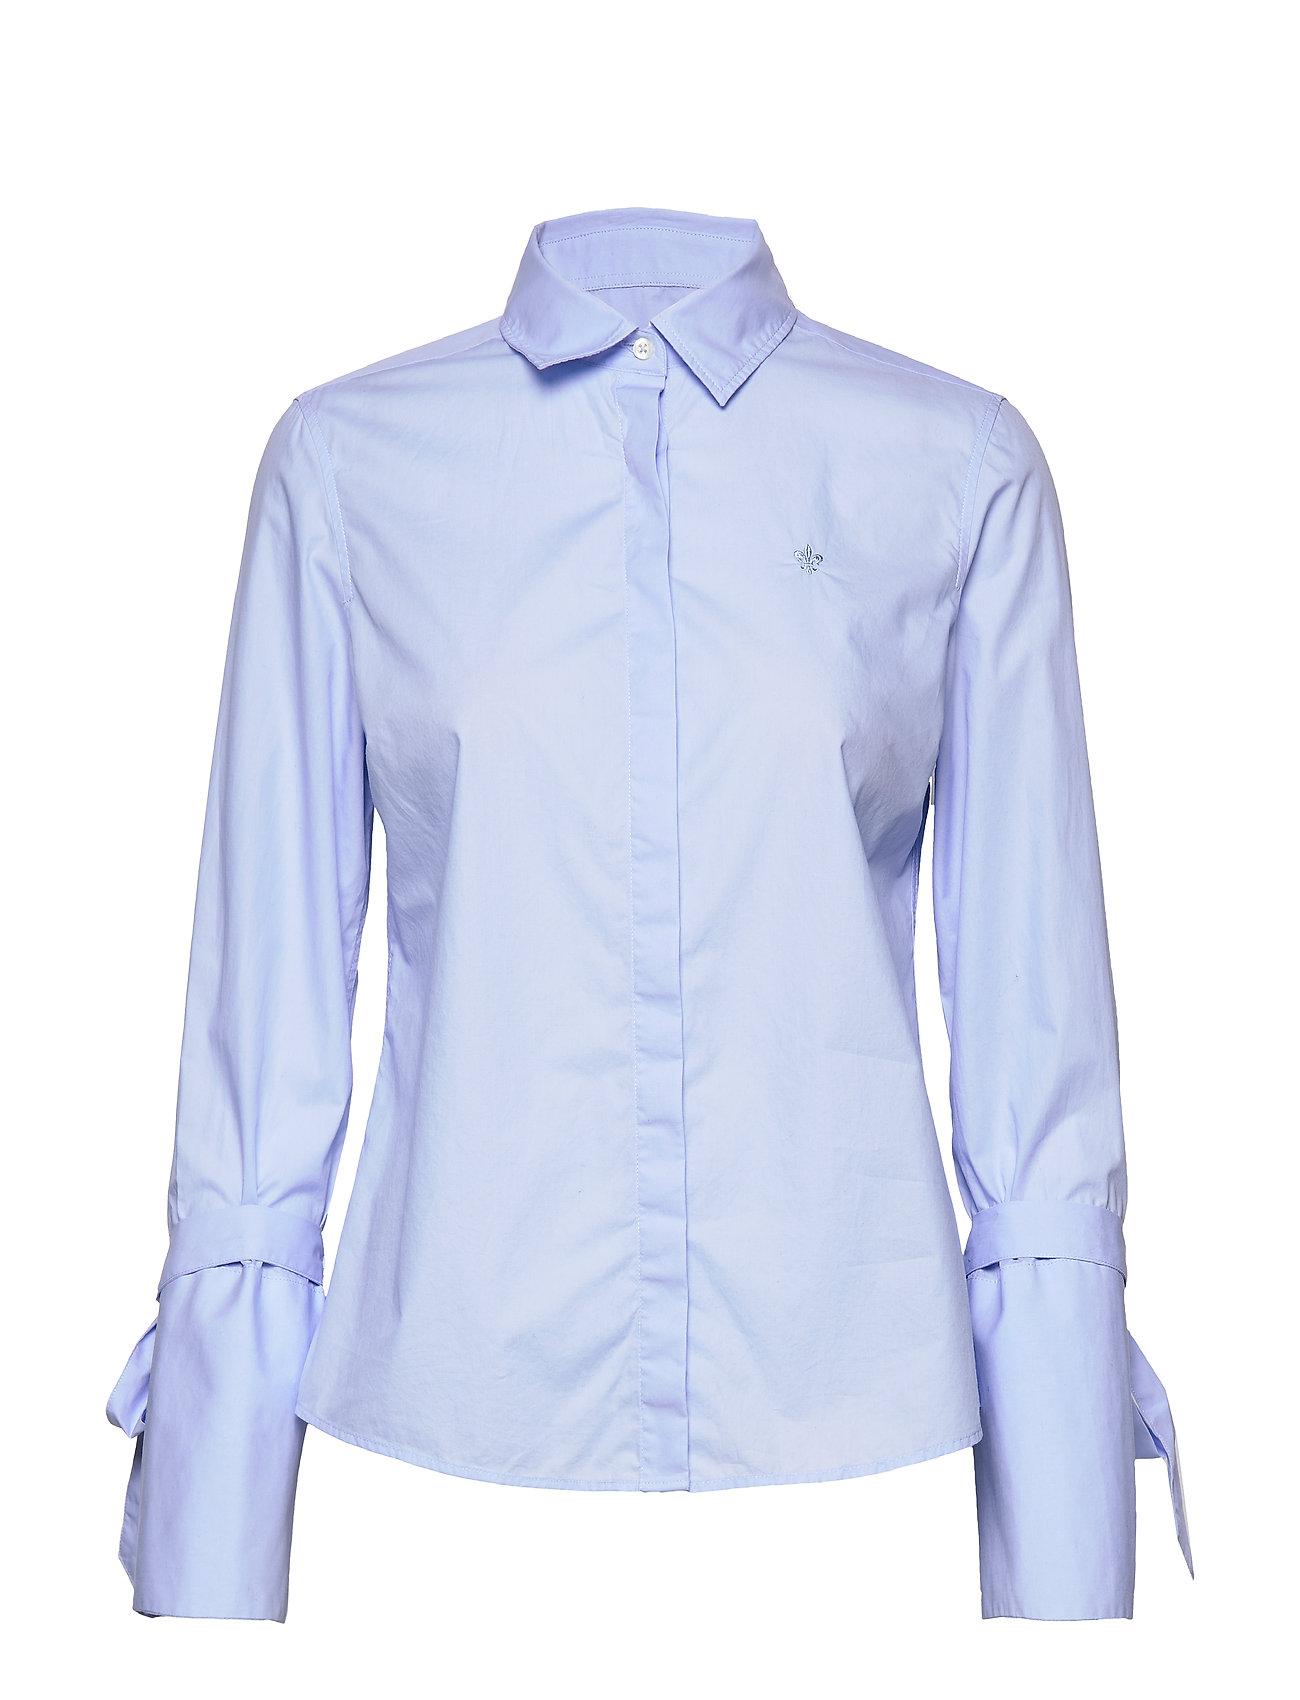 Morris Lady Nicolette Shirt - LIGHT BLUE